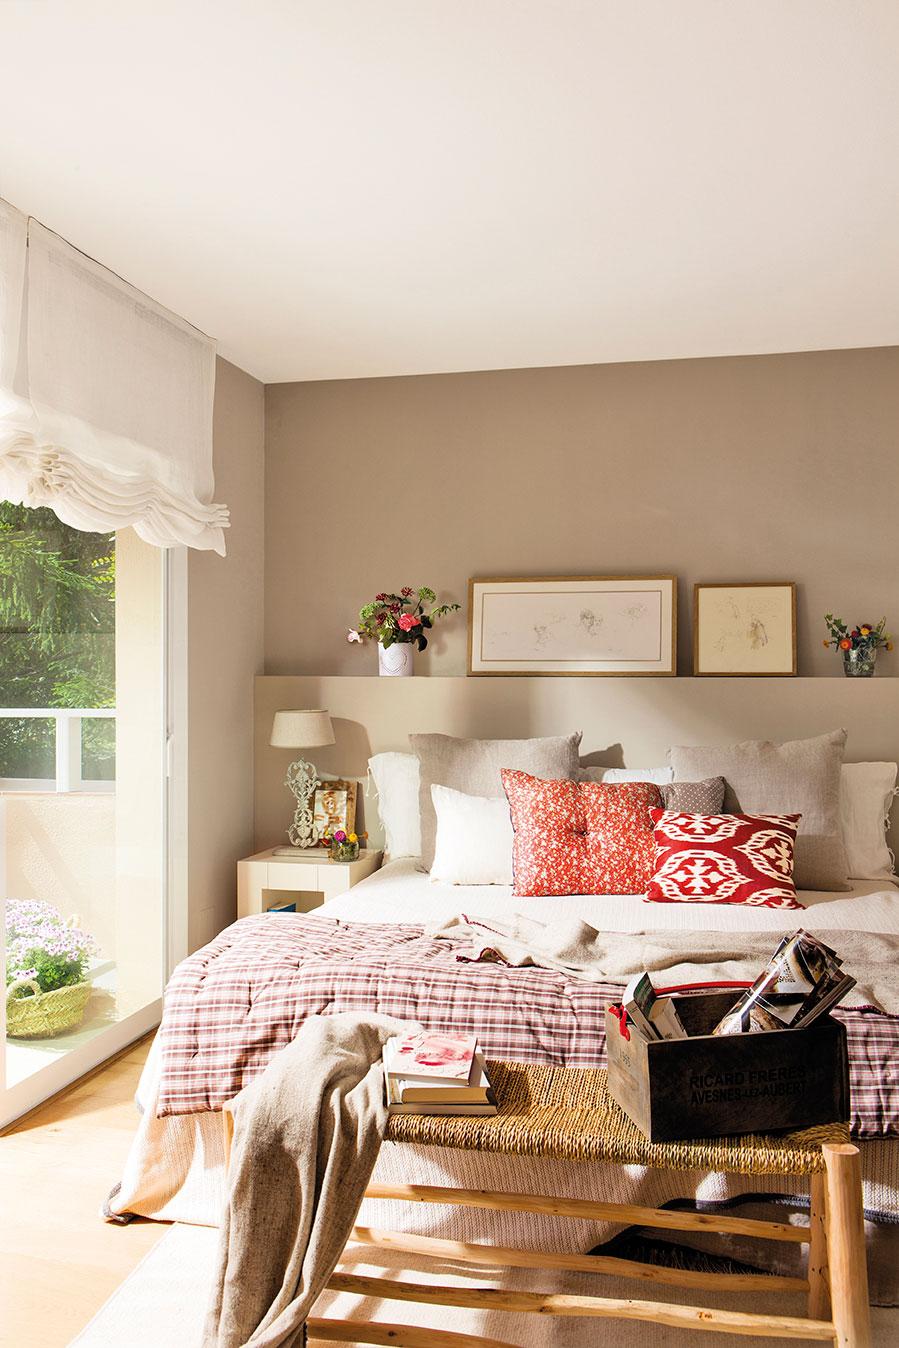 Matrimonio Bed Bugs : Banqueta pie de cama ikea stunning cargando zoom with